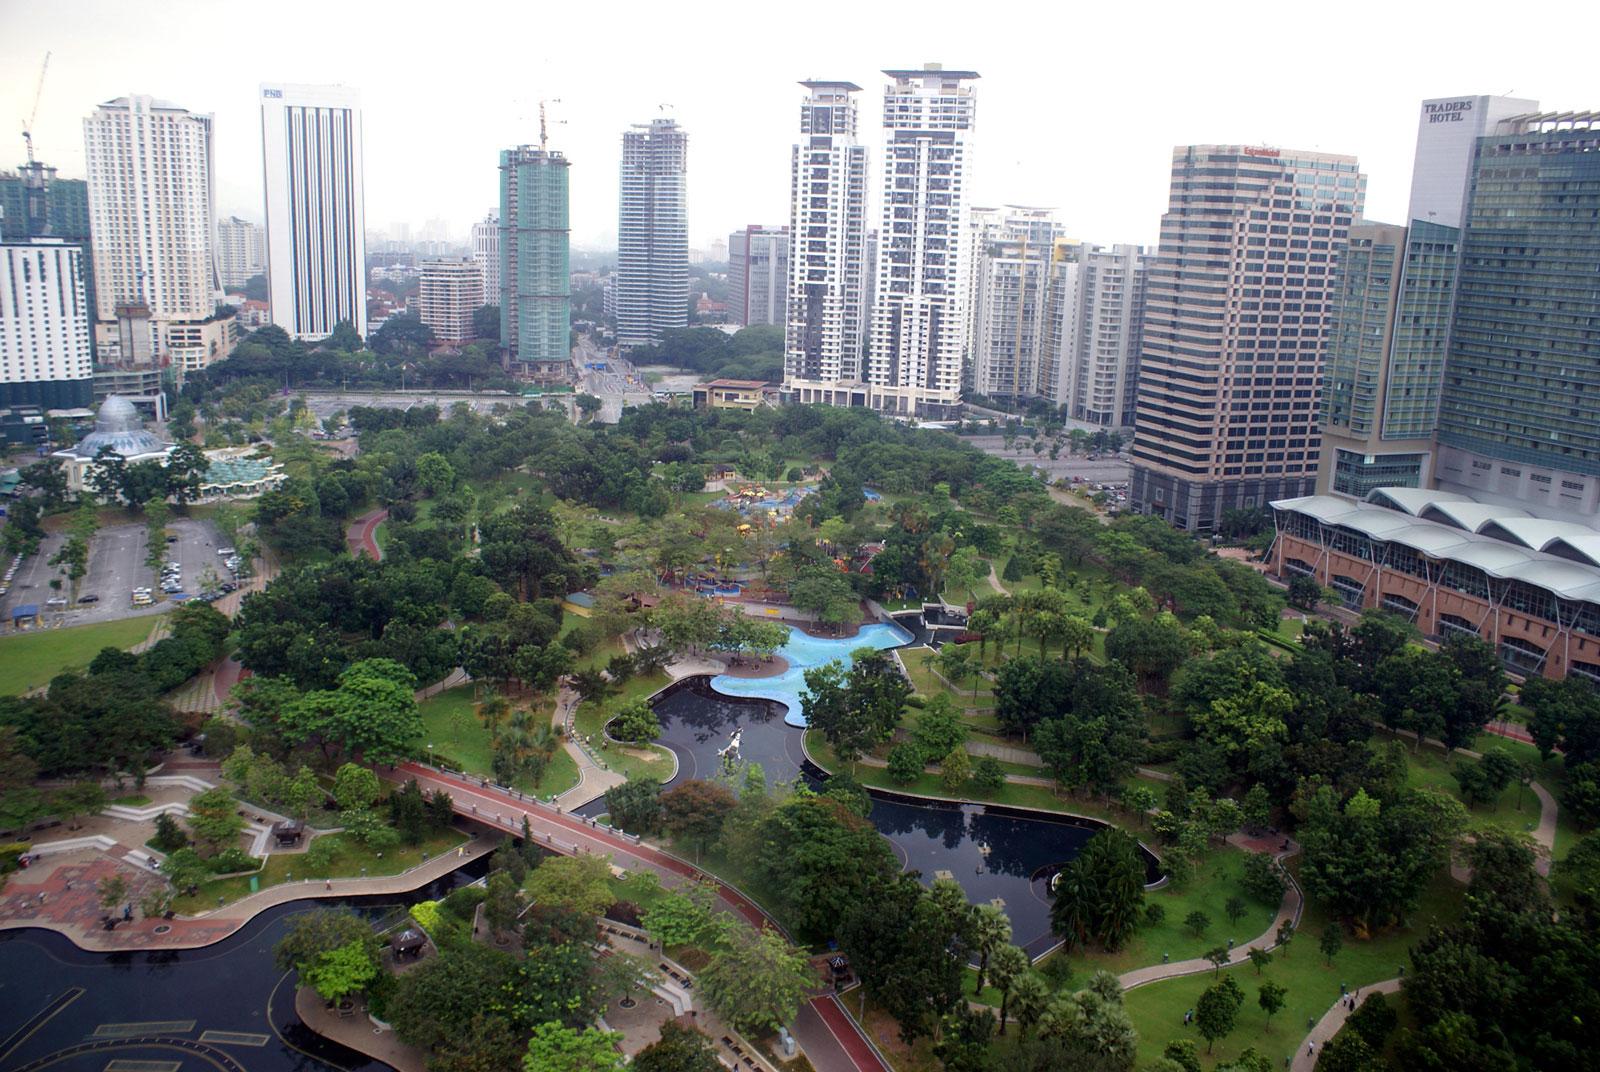 Kuala Lumpur City Centre Park (1998), based on a design by Burle Marx, Kuala Lumpur, Malaysia, May 19, 2008